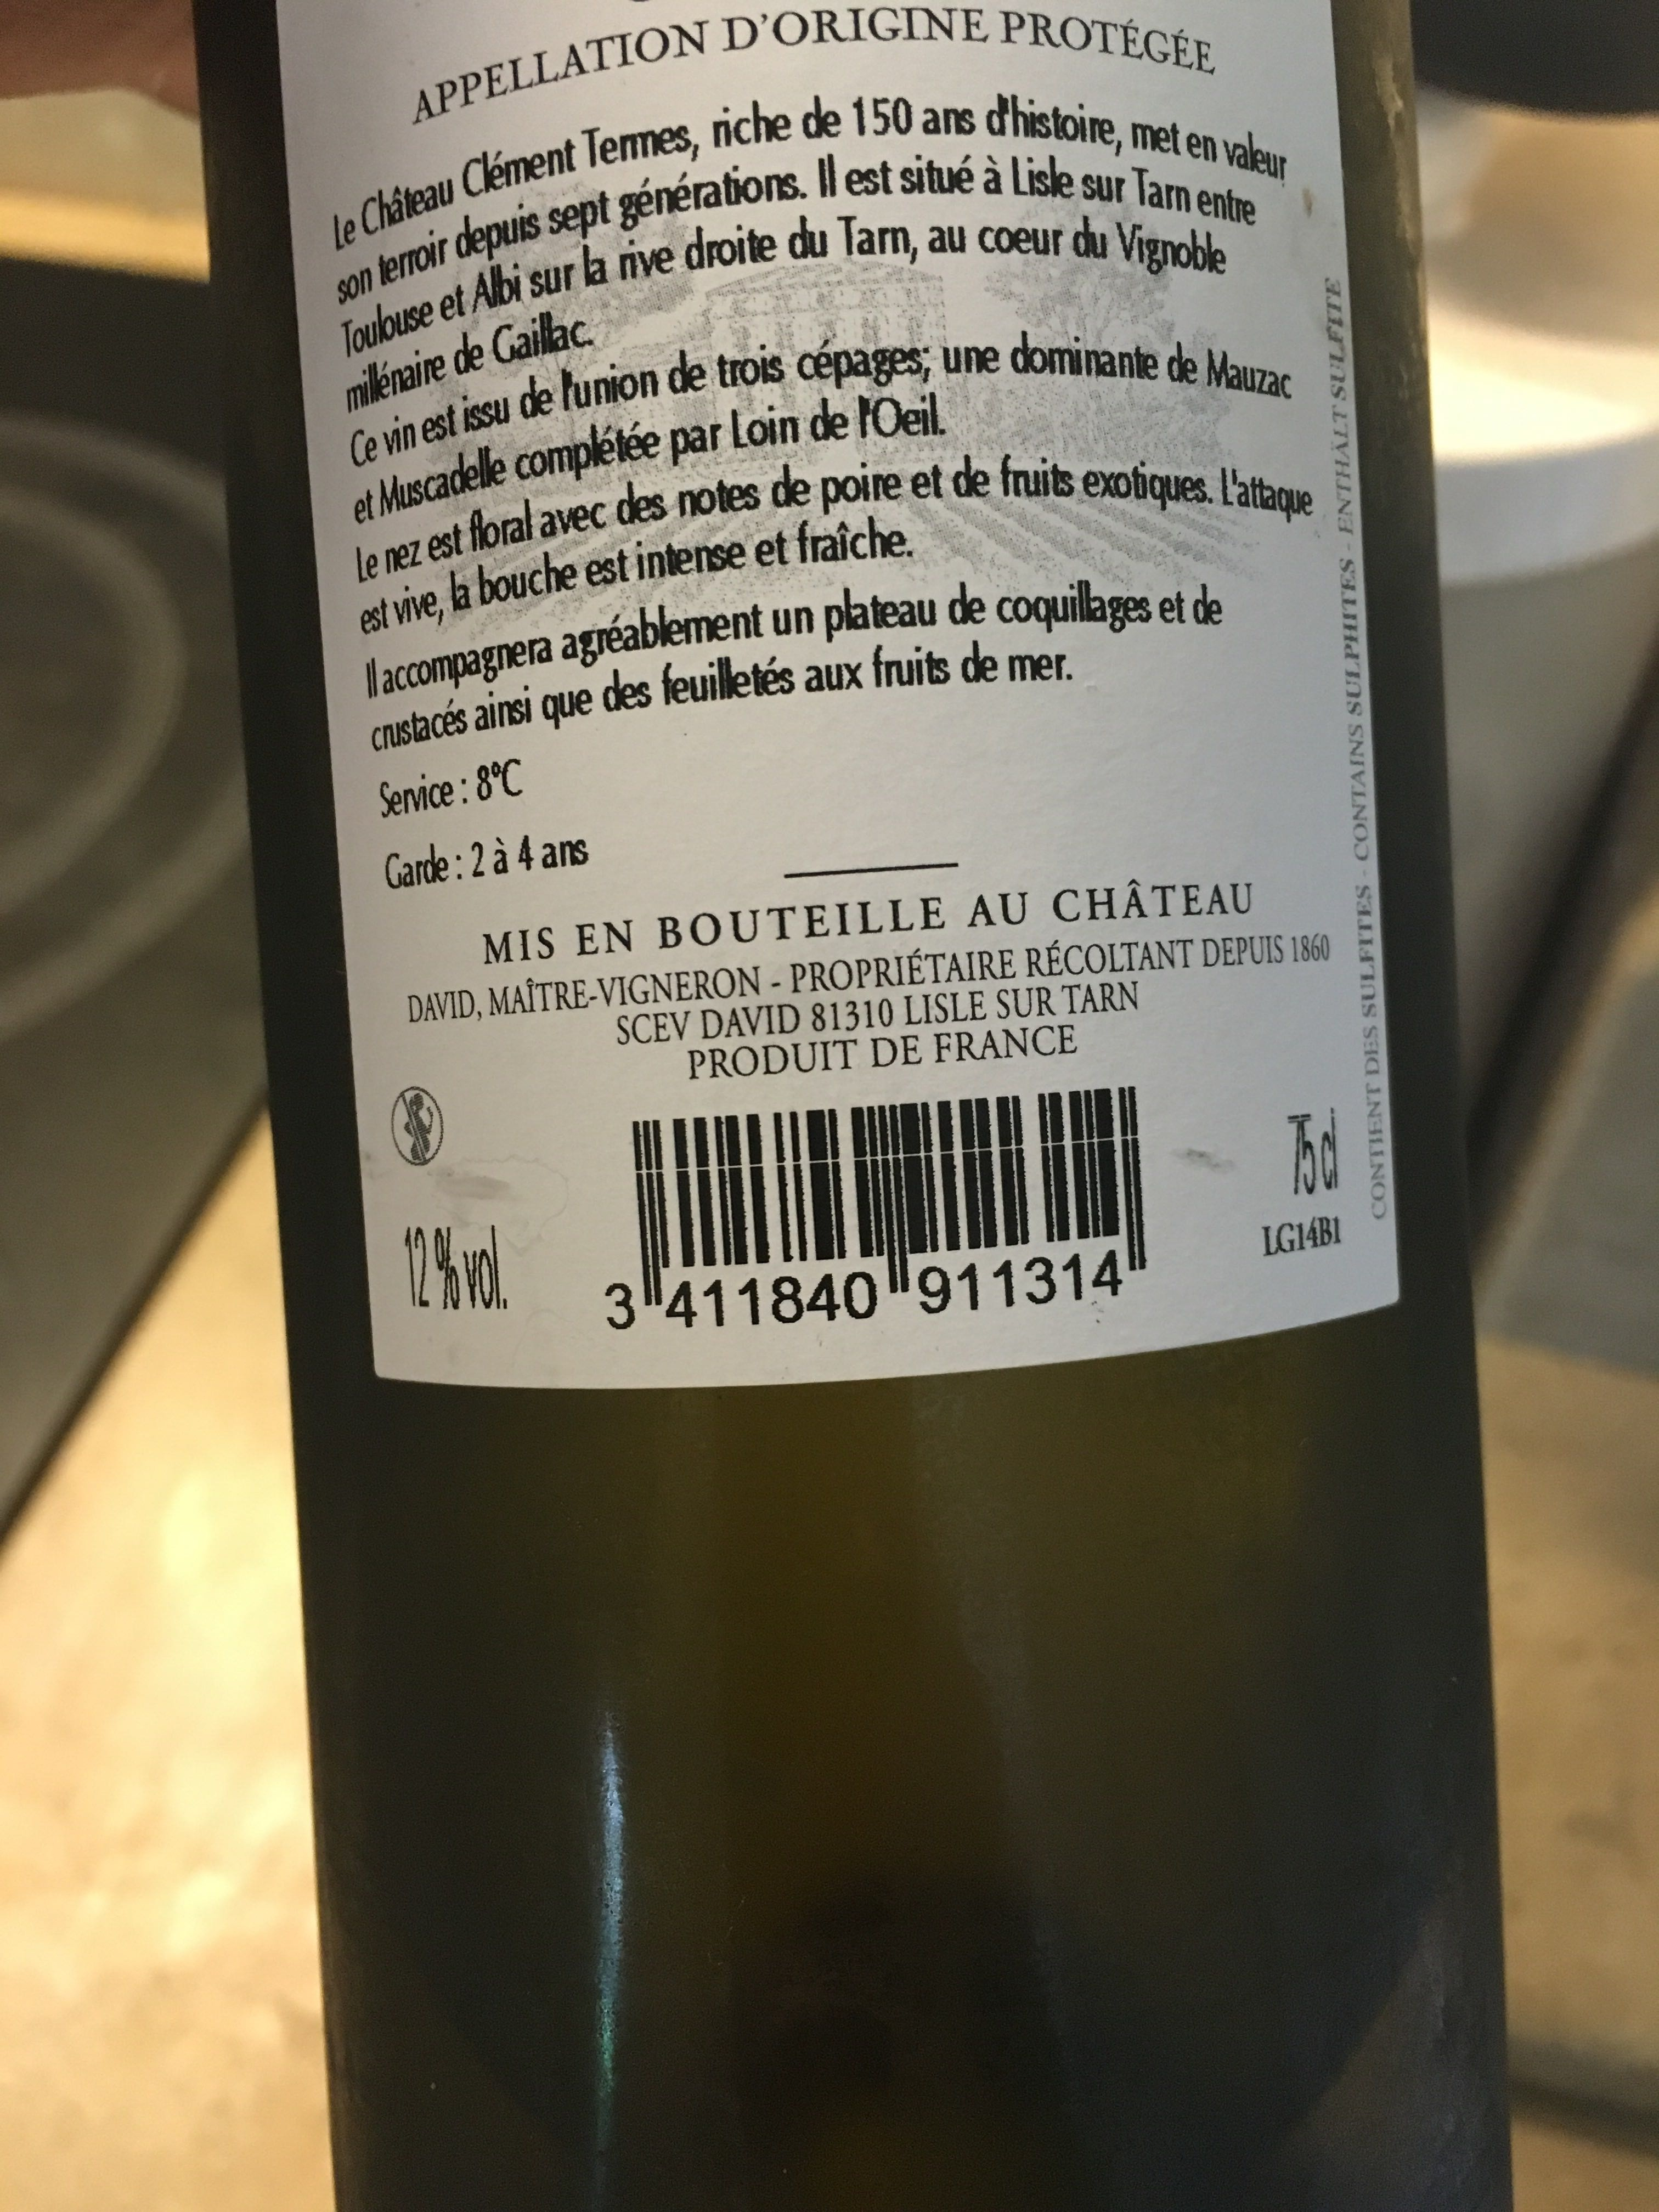 Vin blanc sec 2014 - Product - fr